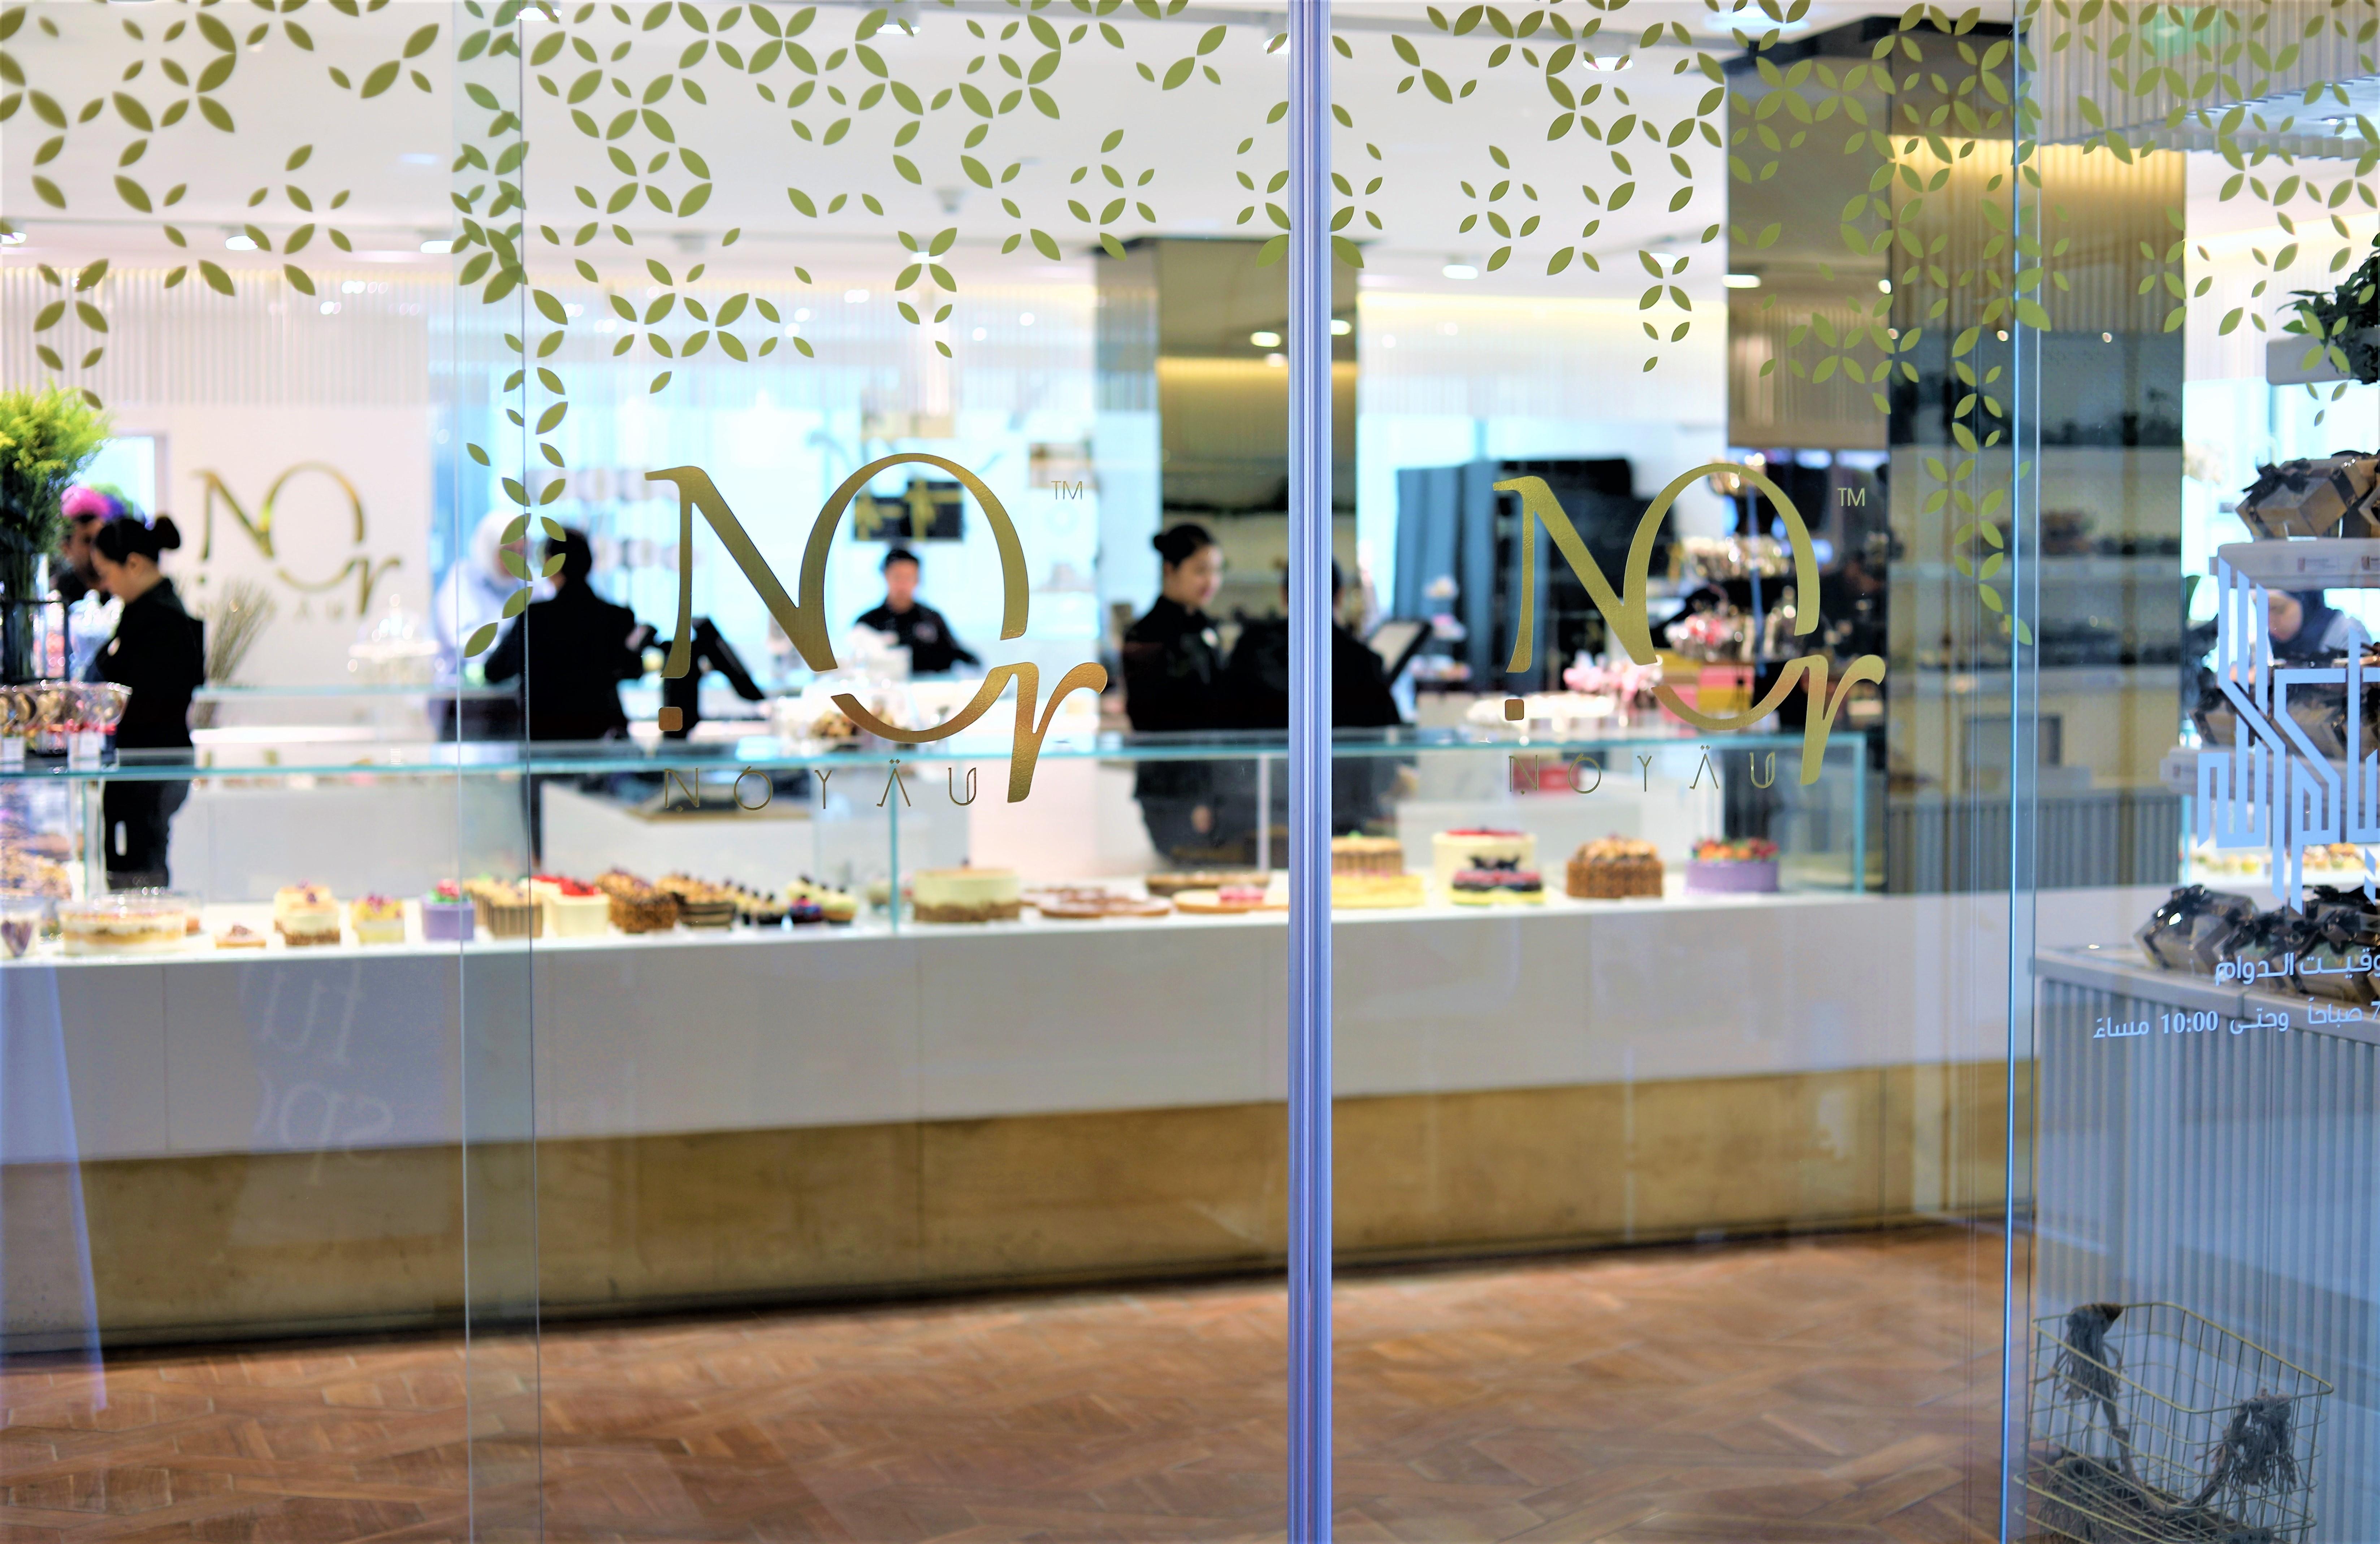 Nor Noyau™ Company | LinkedIn